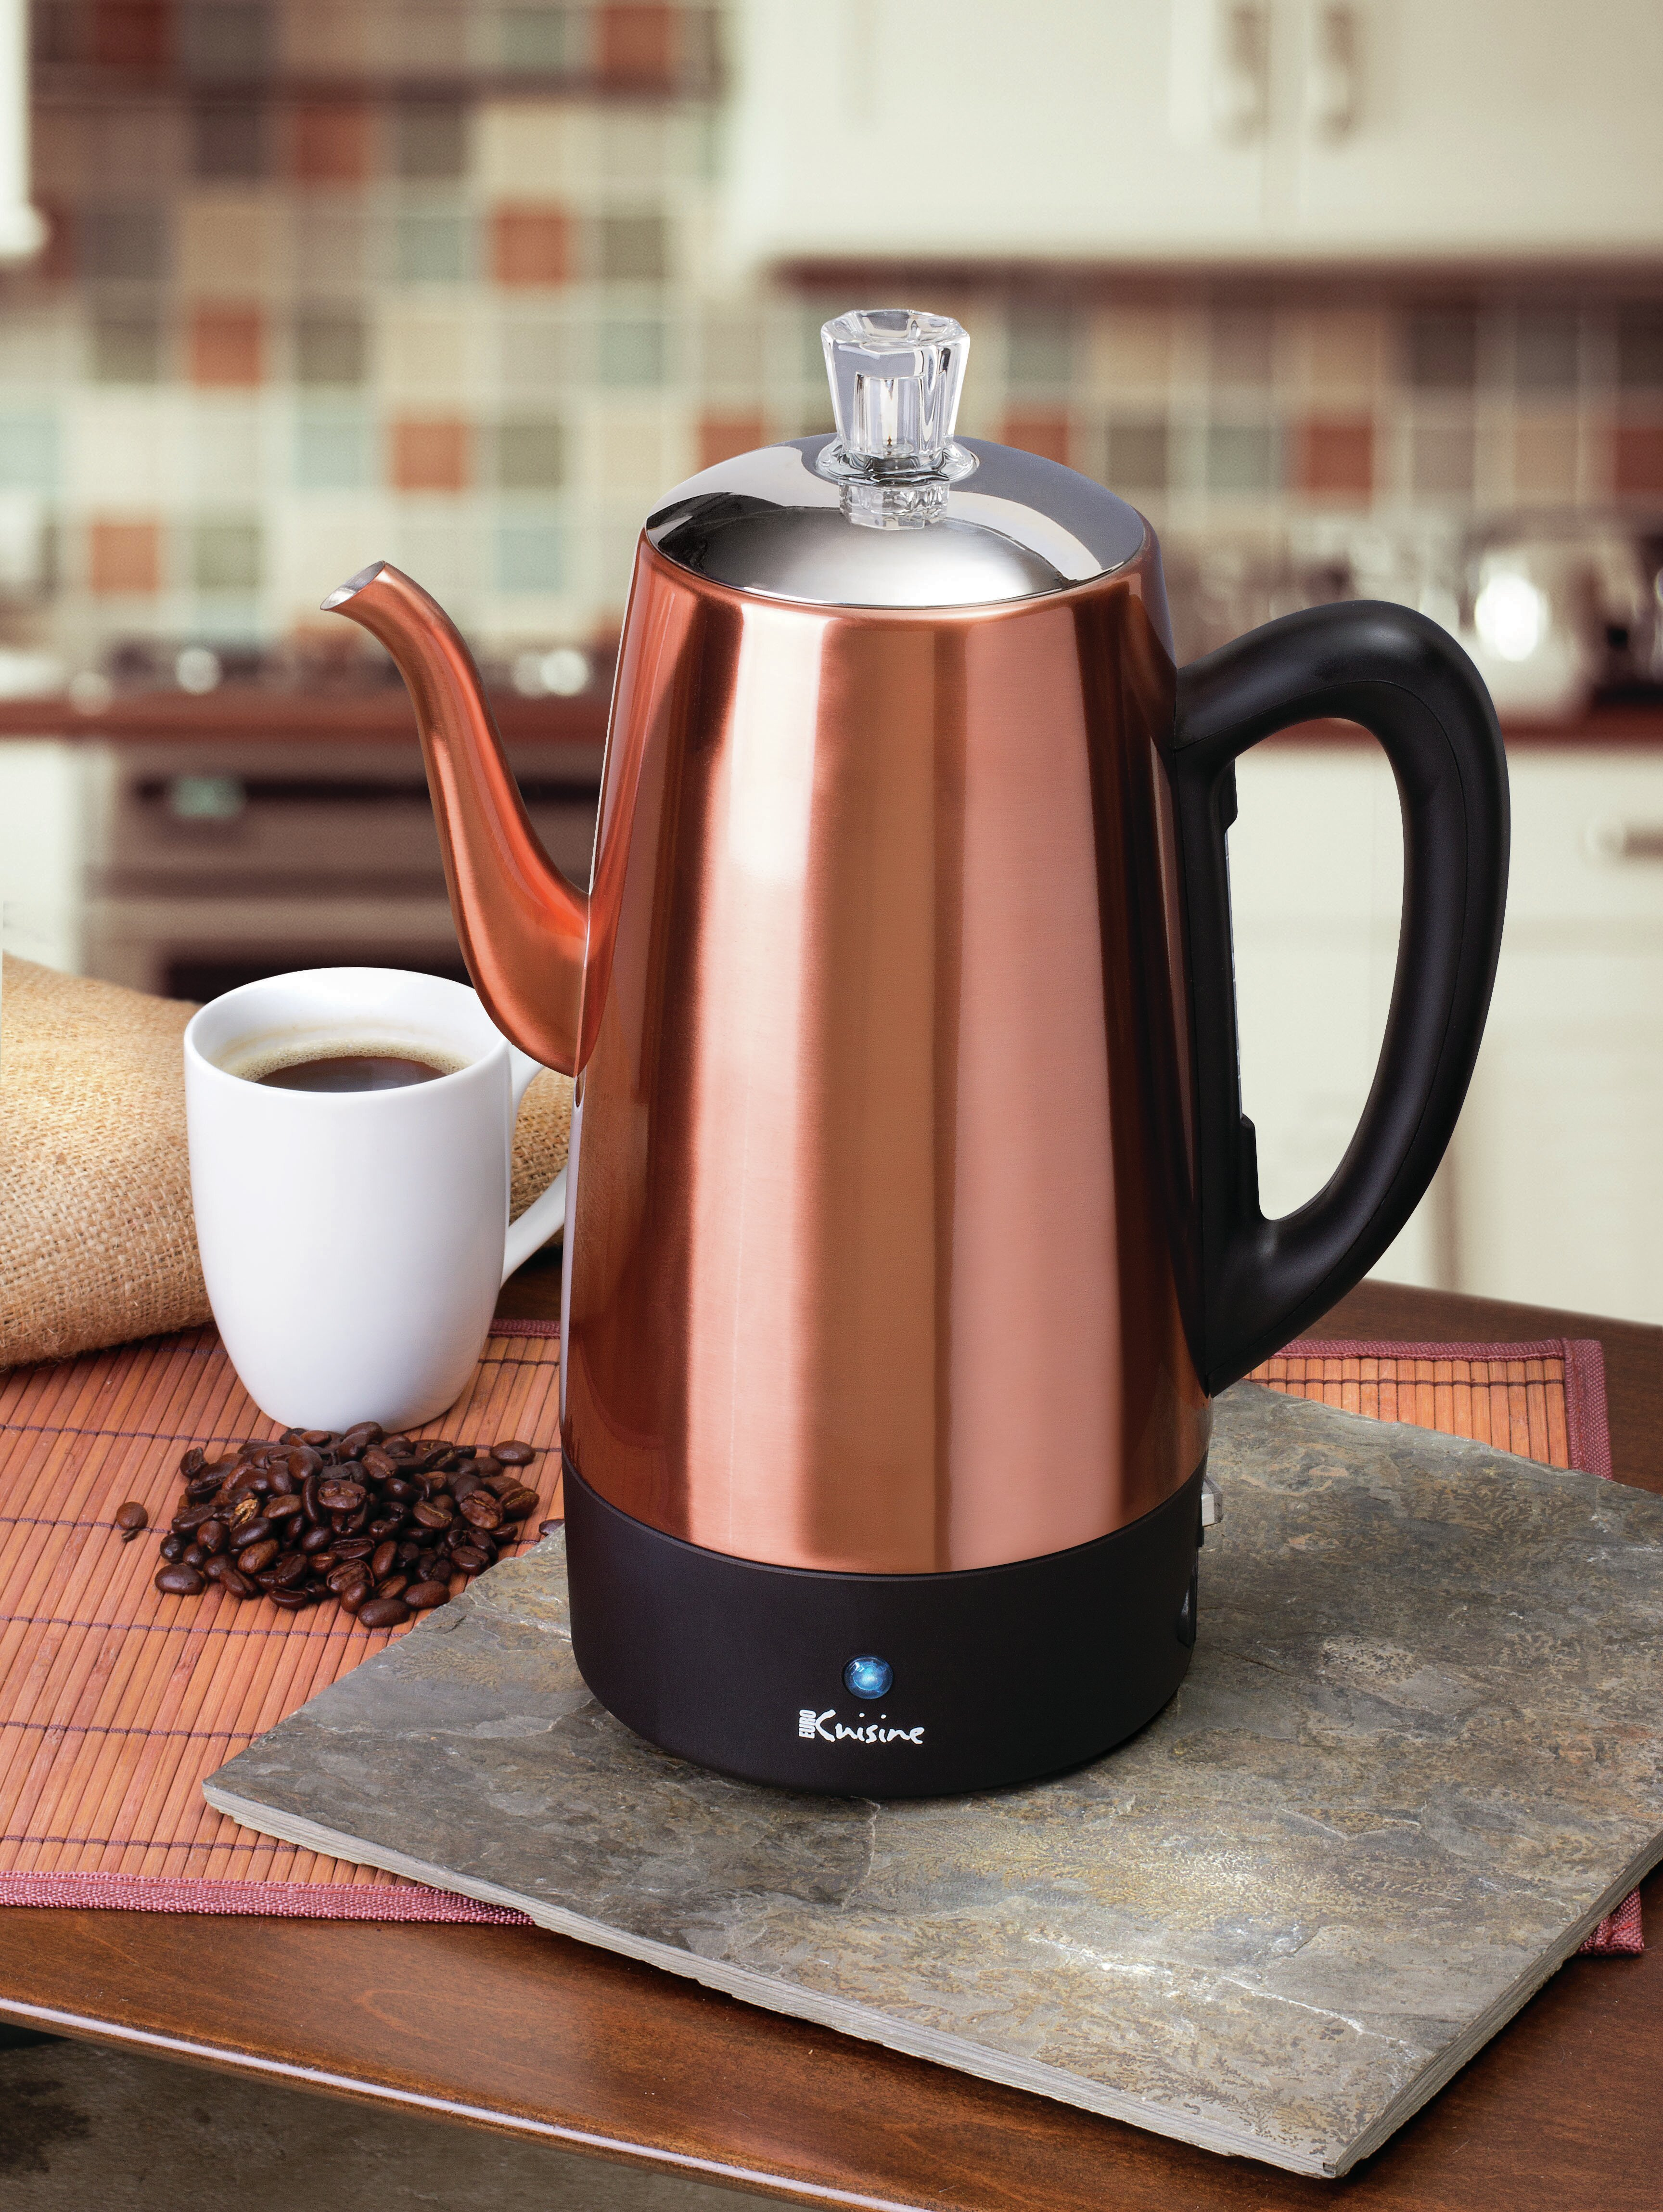 Euro Cuisine Electric Coffee Maker & Reviews | Wayfair